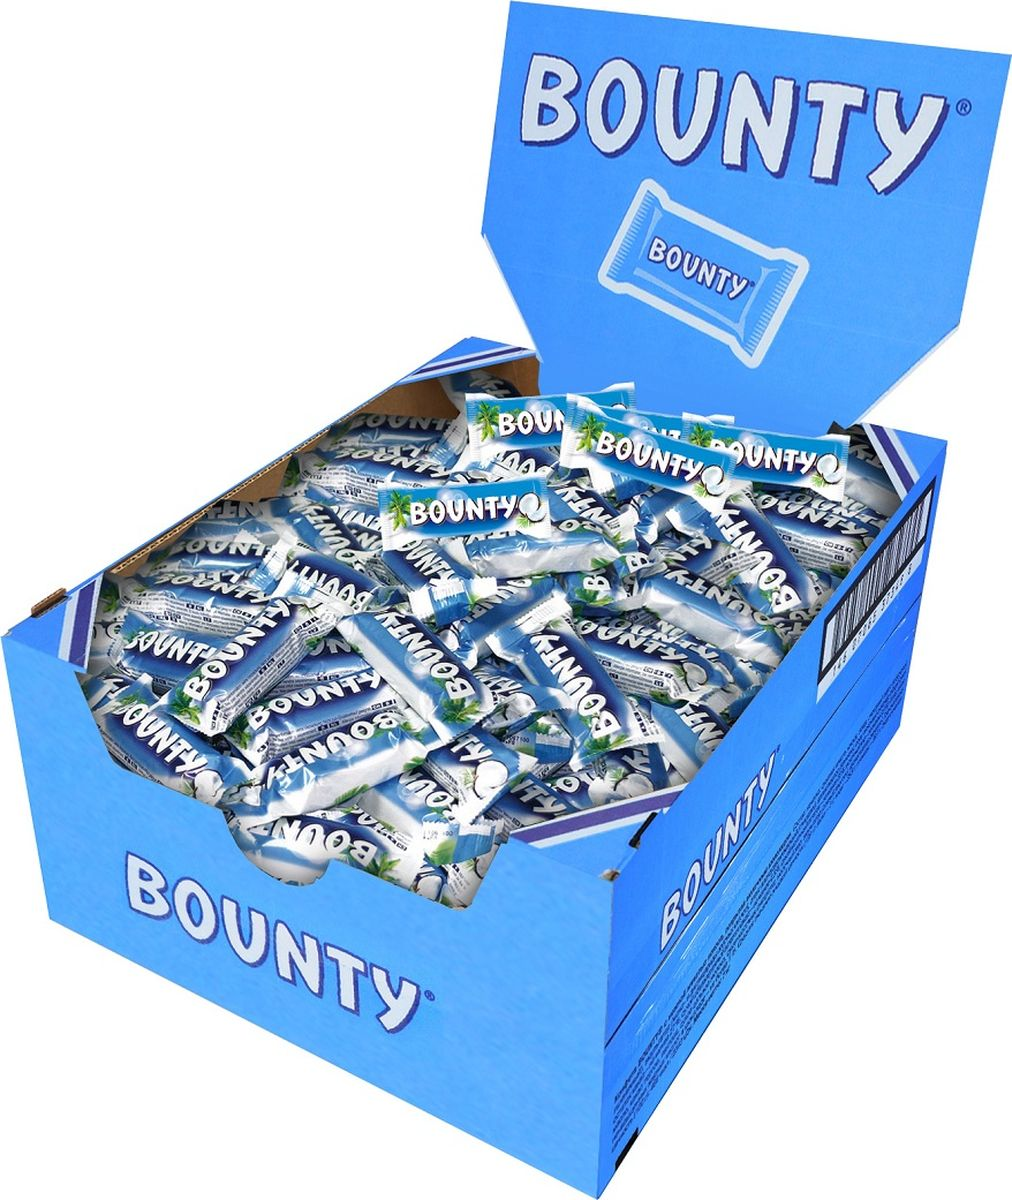 Bounty Minis шоколадный батончик, 3 кг bounty trio шоколадный батончик 82 5 г